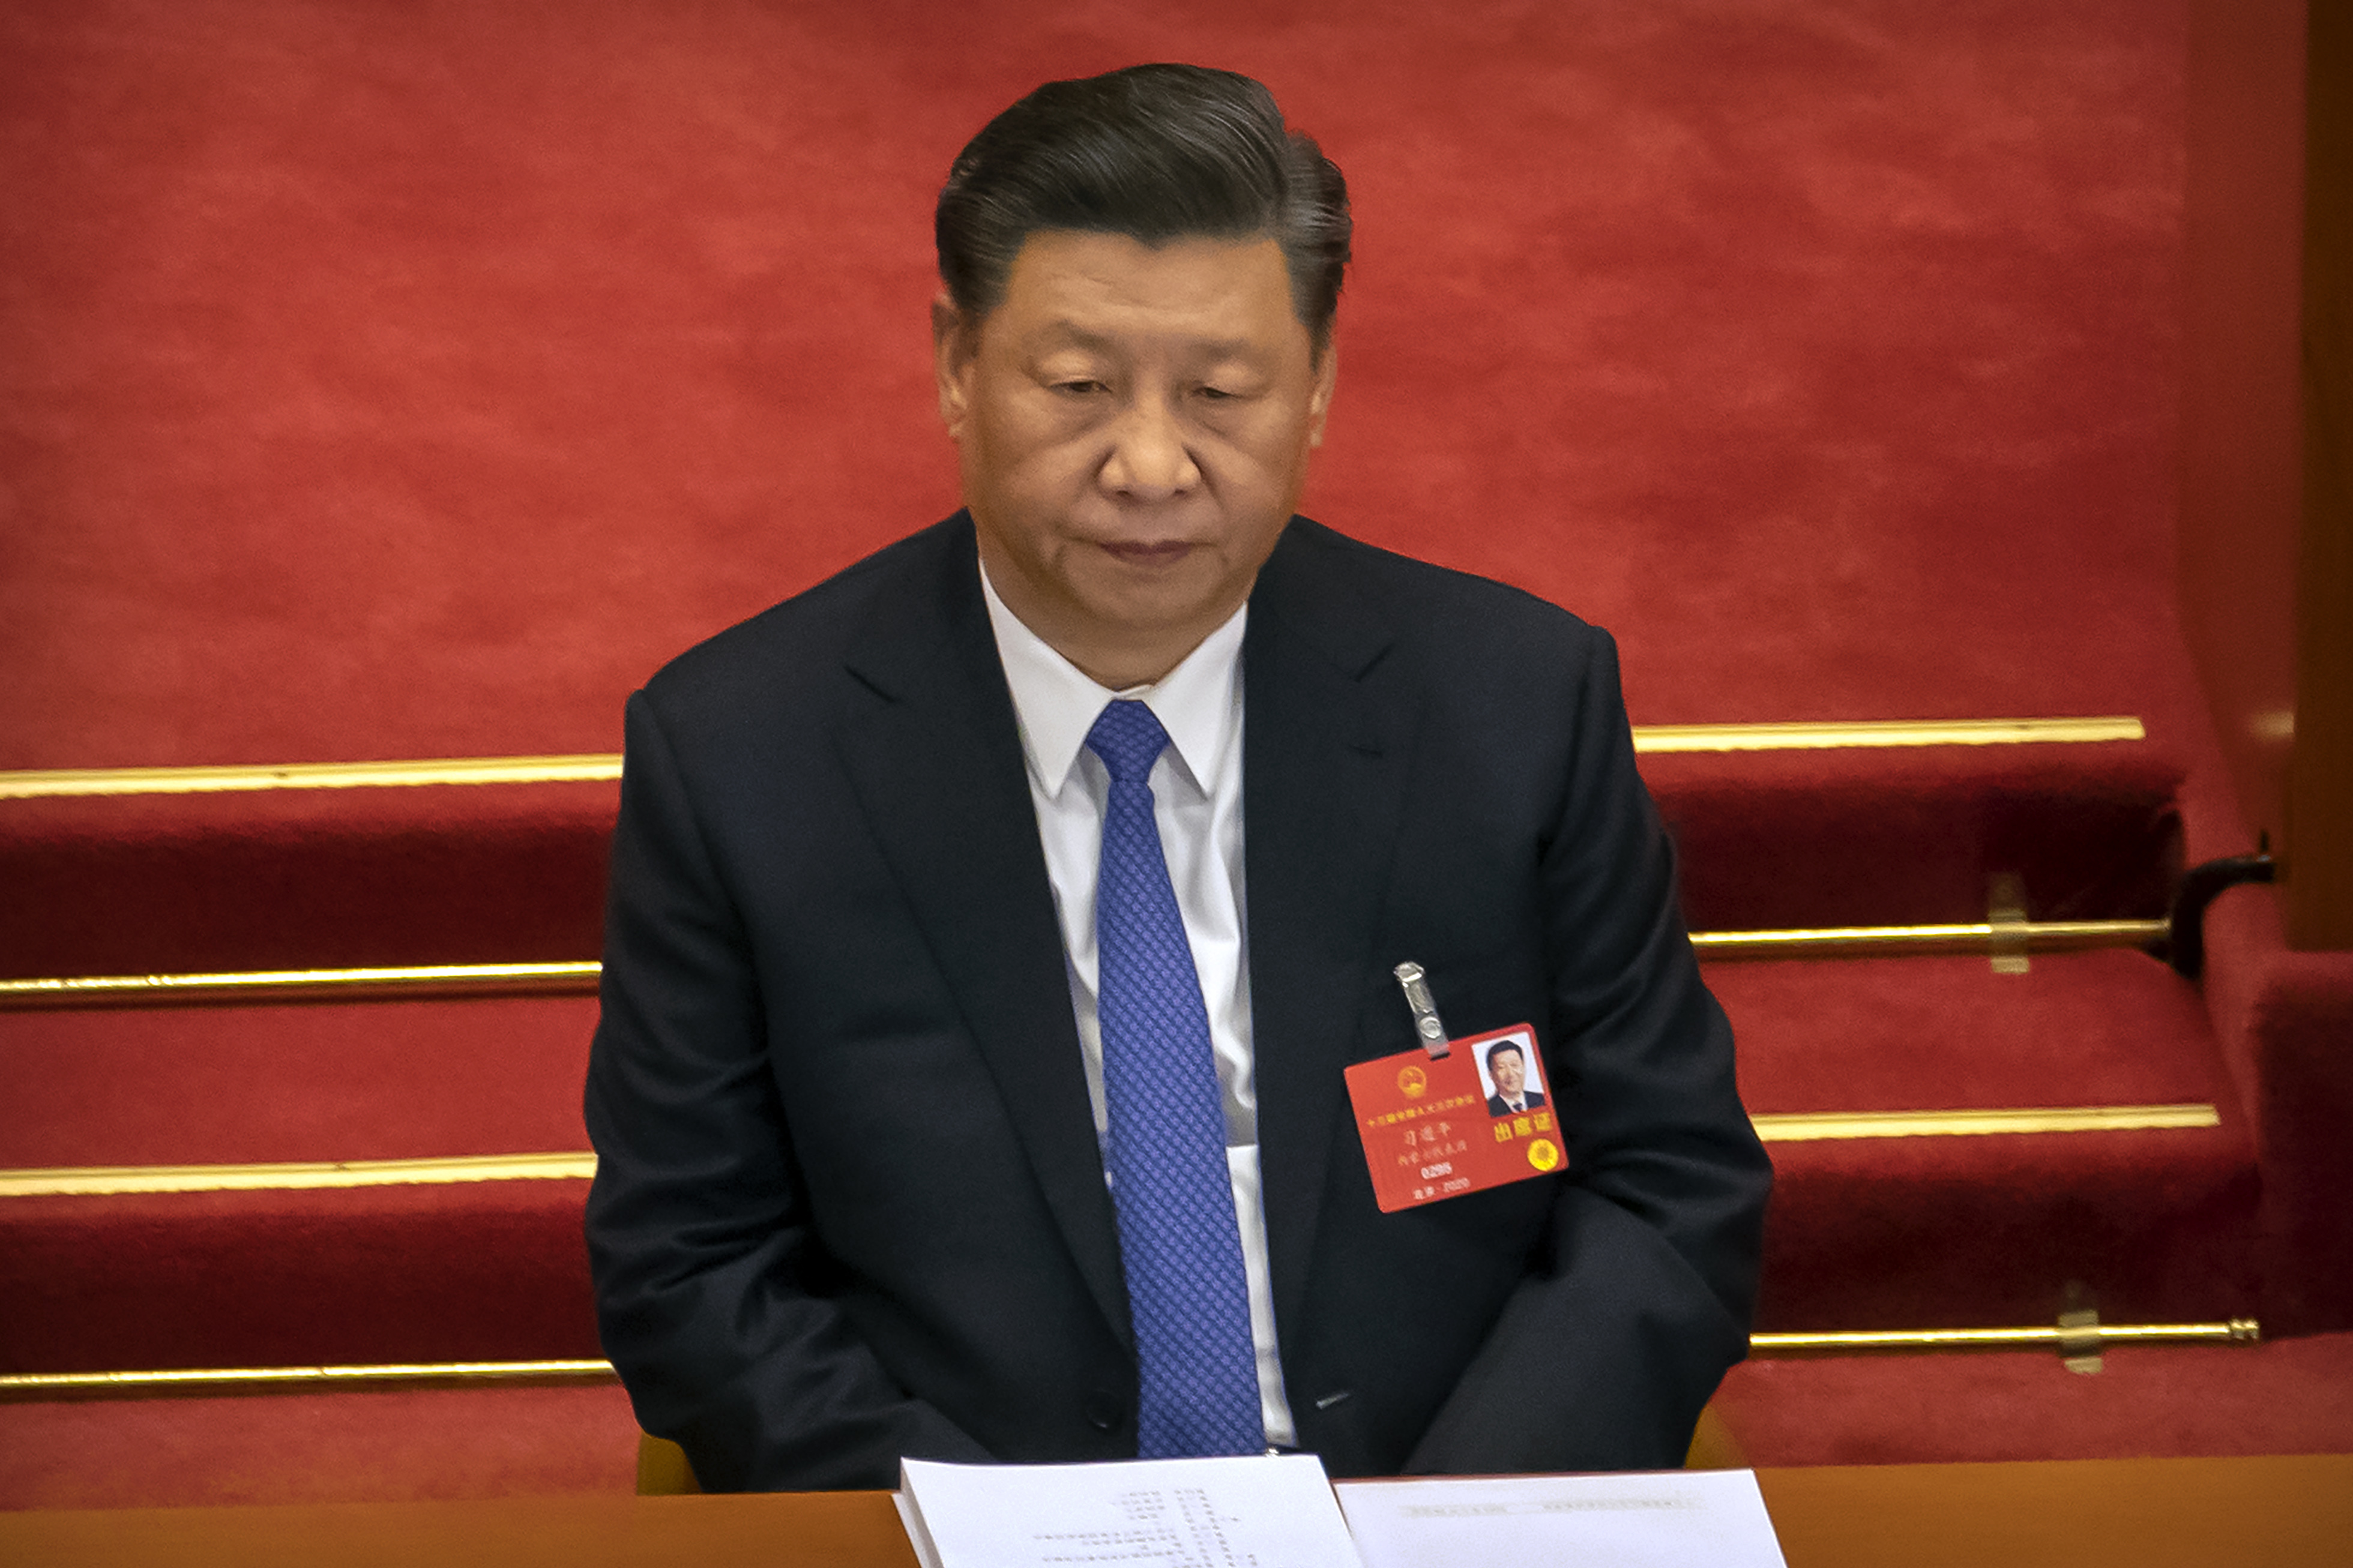 Last 2 journalists working for Australian media leave China – Fox News